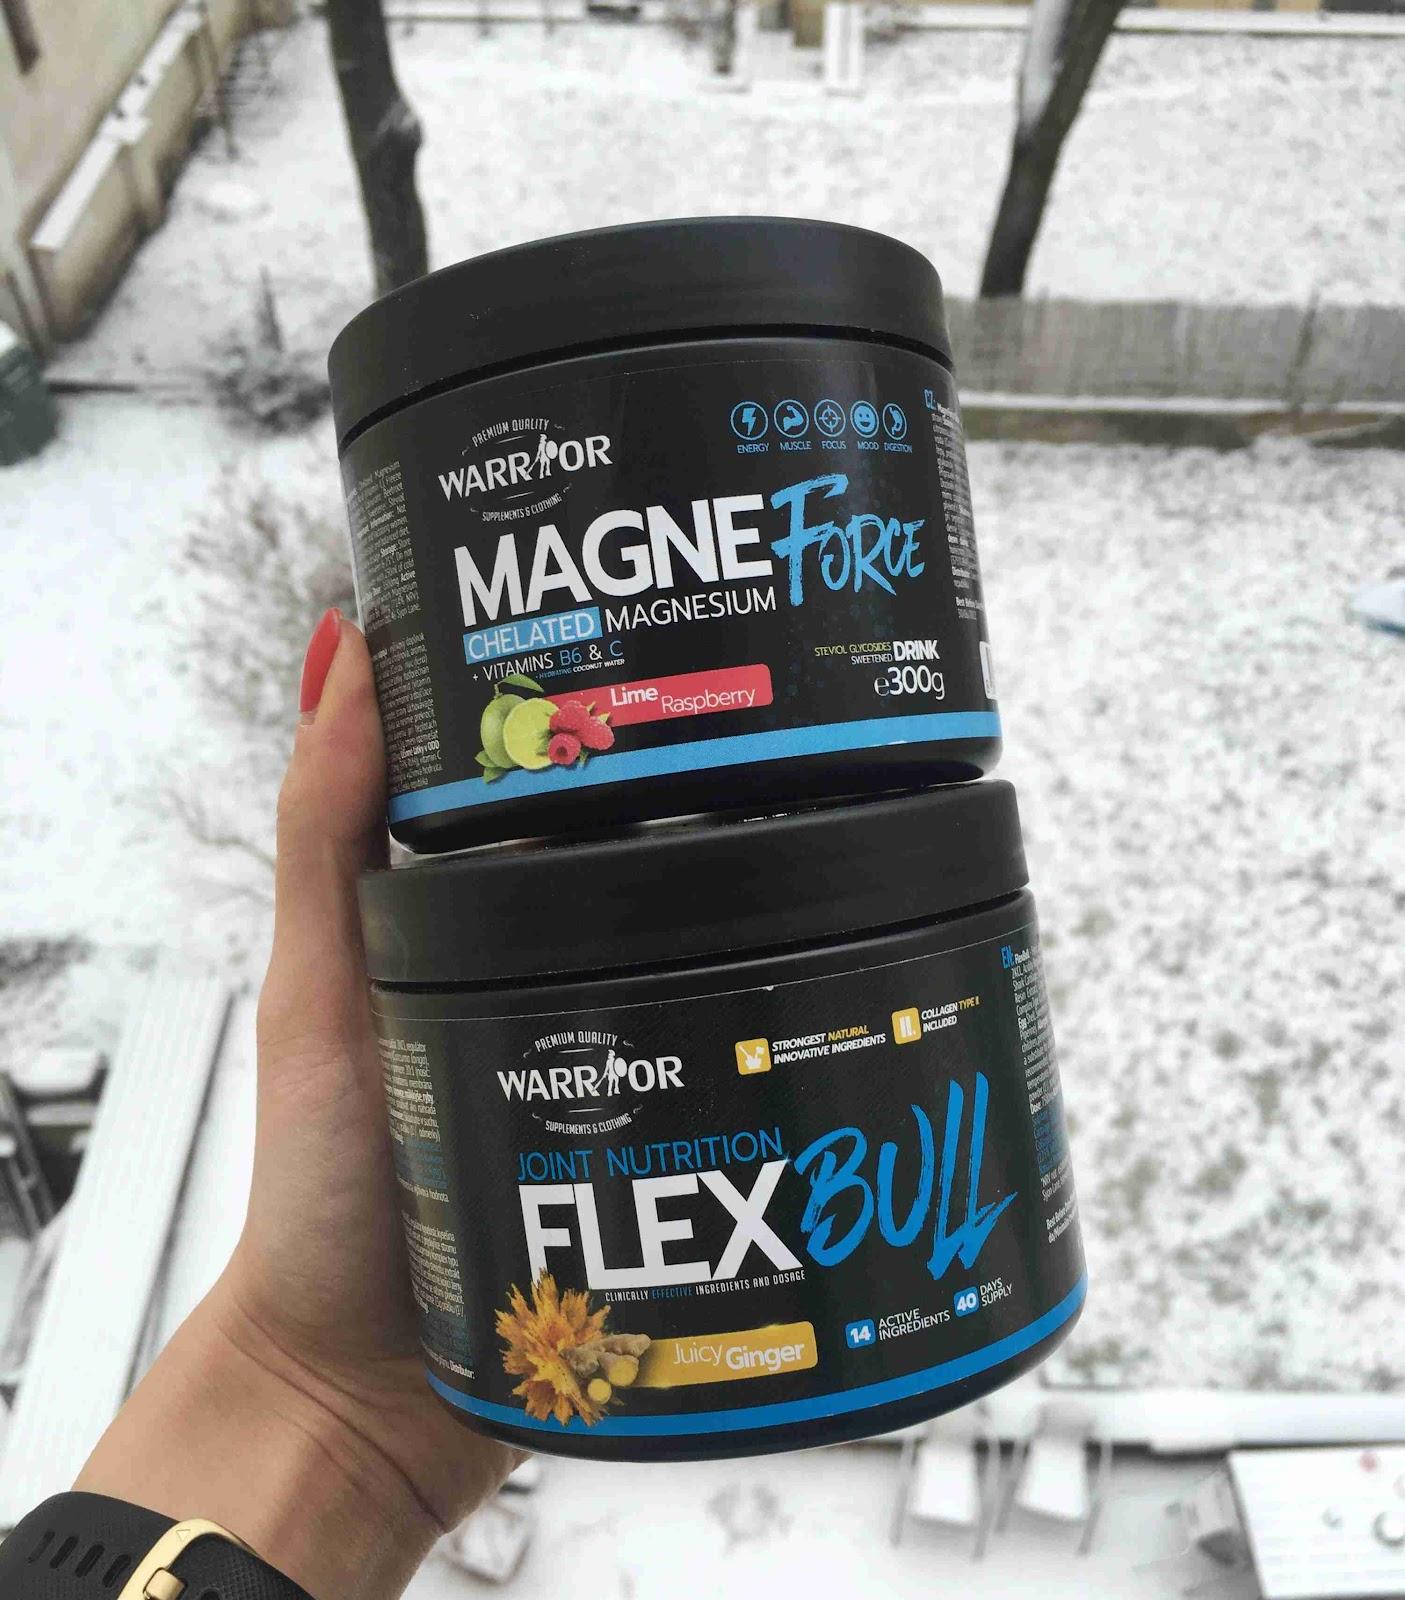 Recenze NaMaximum: MagneForte a FlexBull